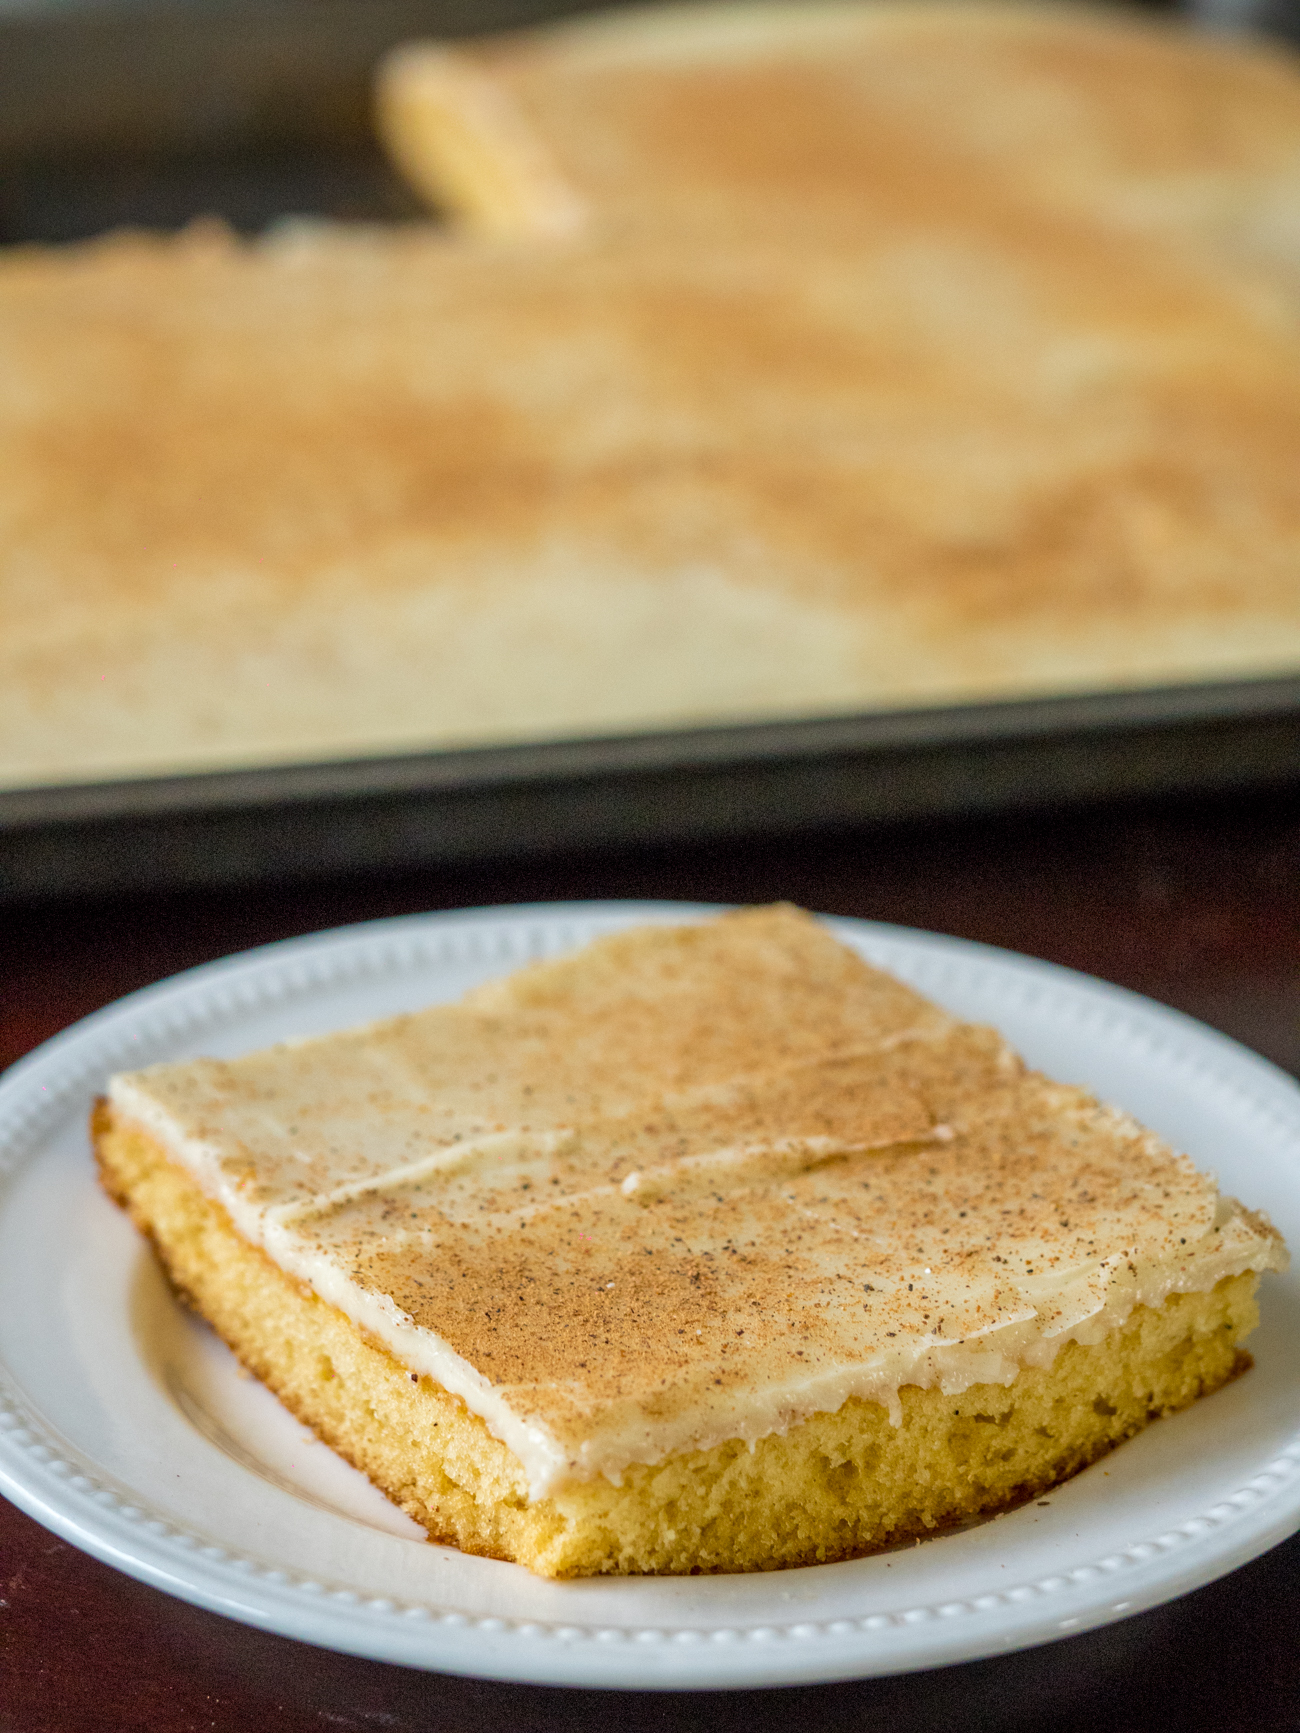 Eggnog Texas Sheetcake Vertical 2